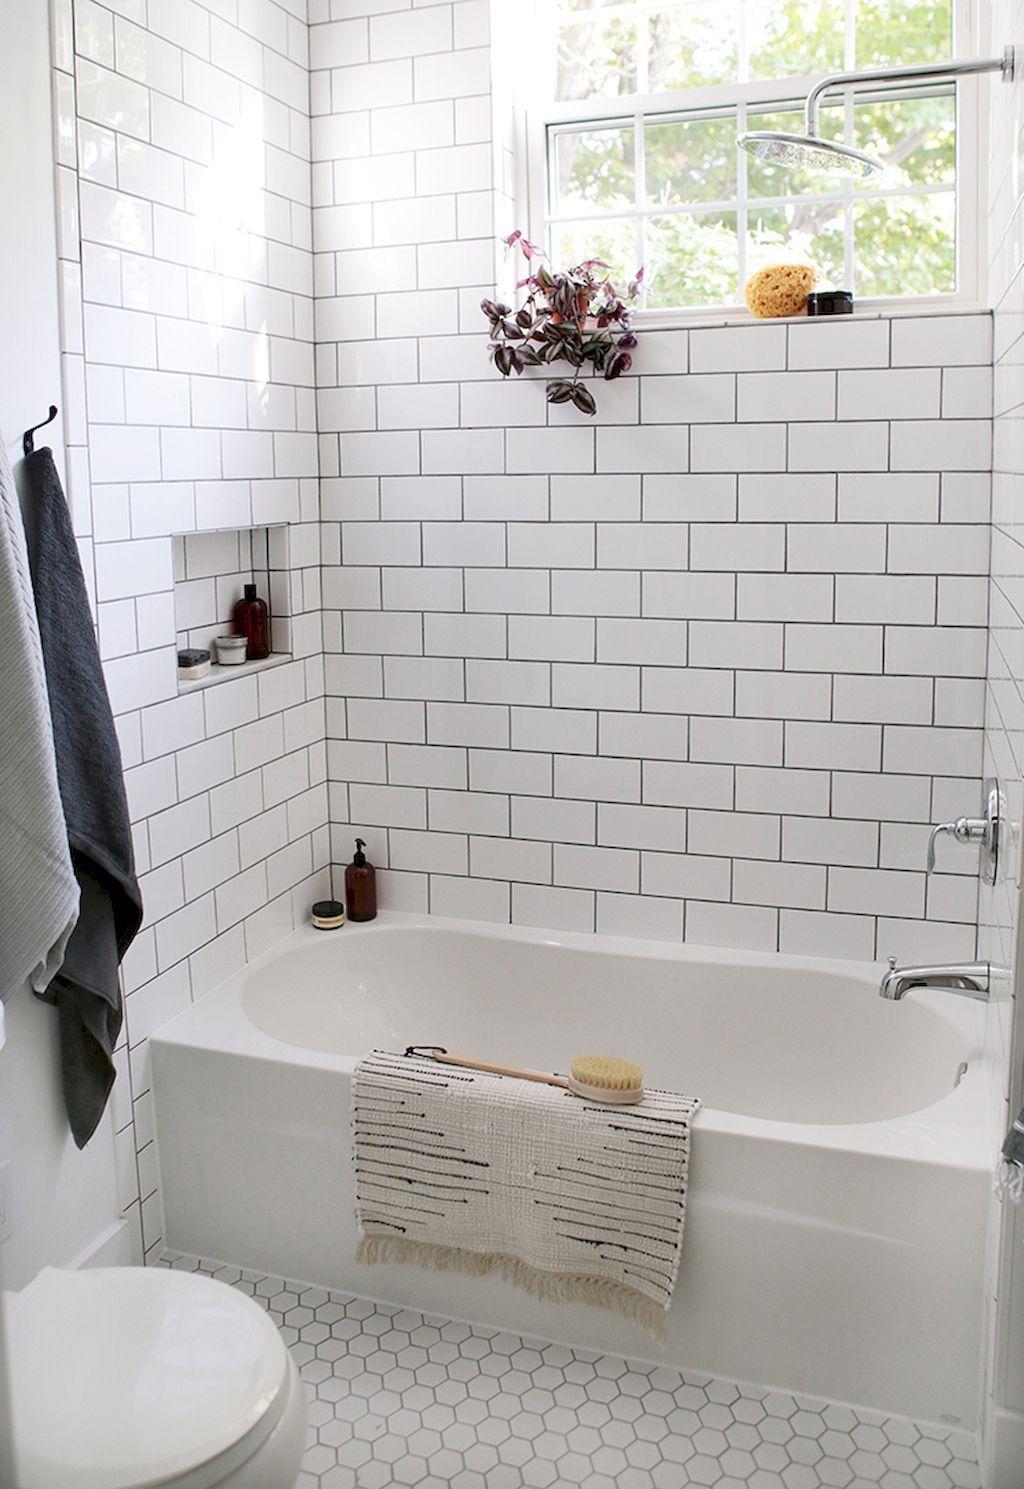 25 Rustic Farmhouse Bathroom Design & Ideas | Rustic farmhouse ...